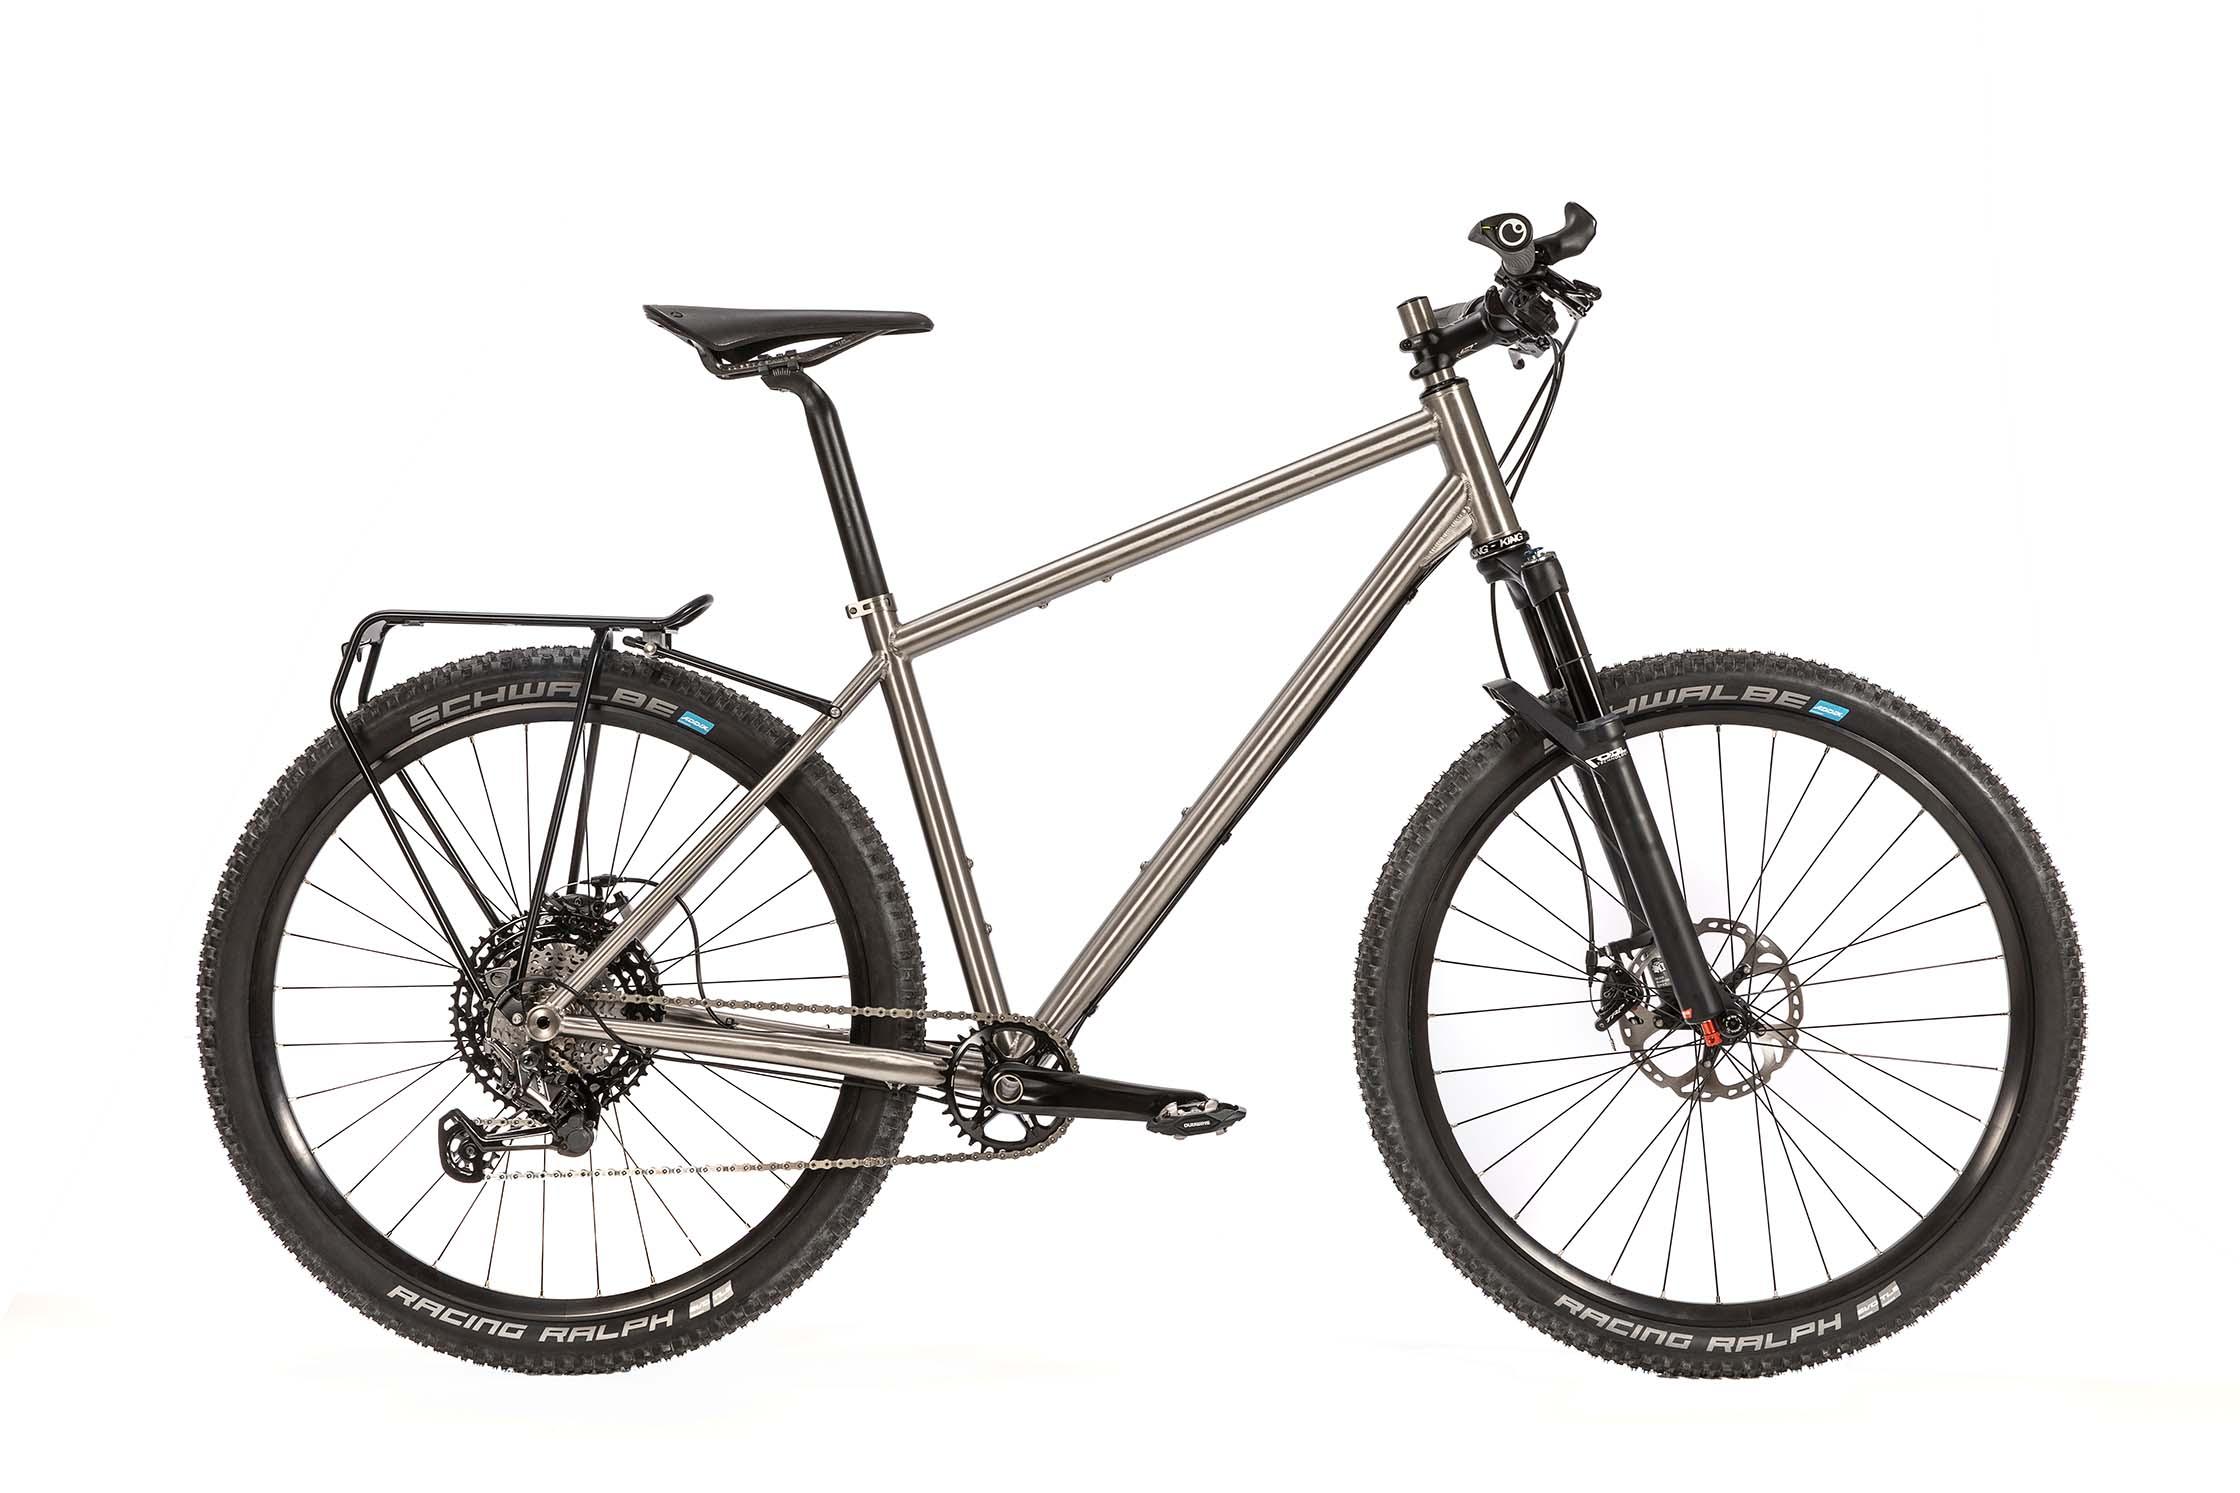 Mass Titan Mountainbike Hardtail für Bike Adventure Touren_1